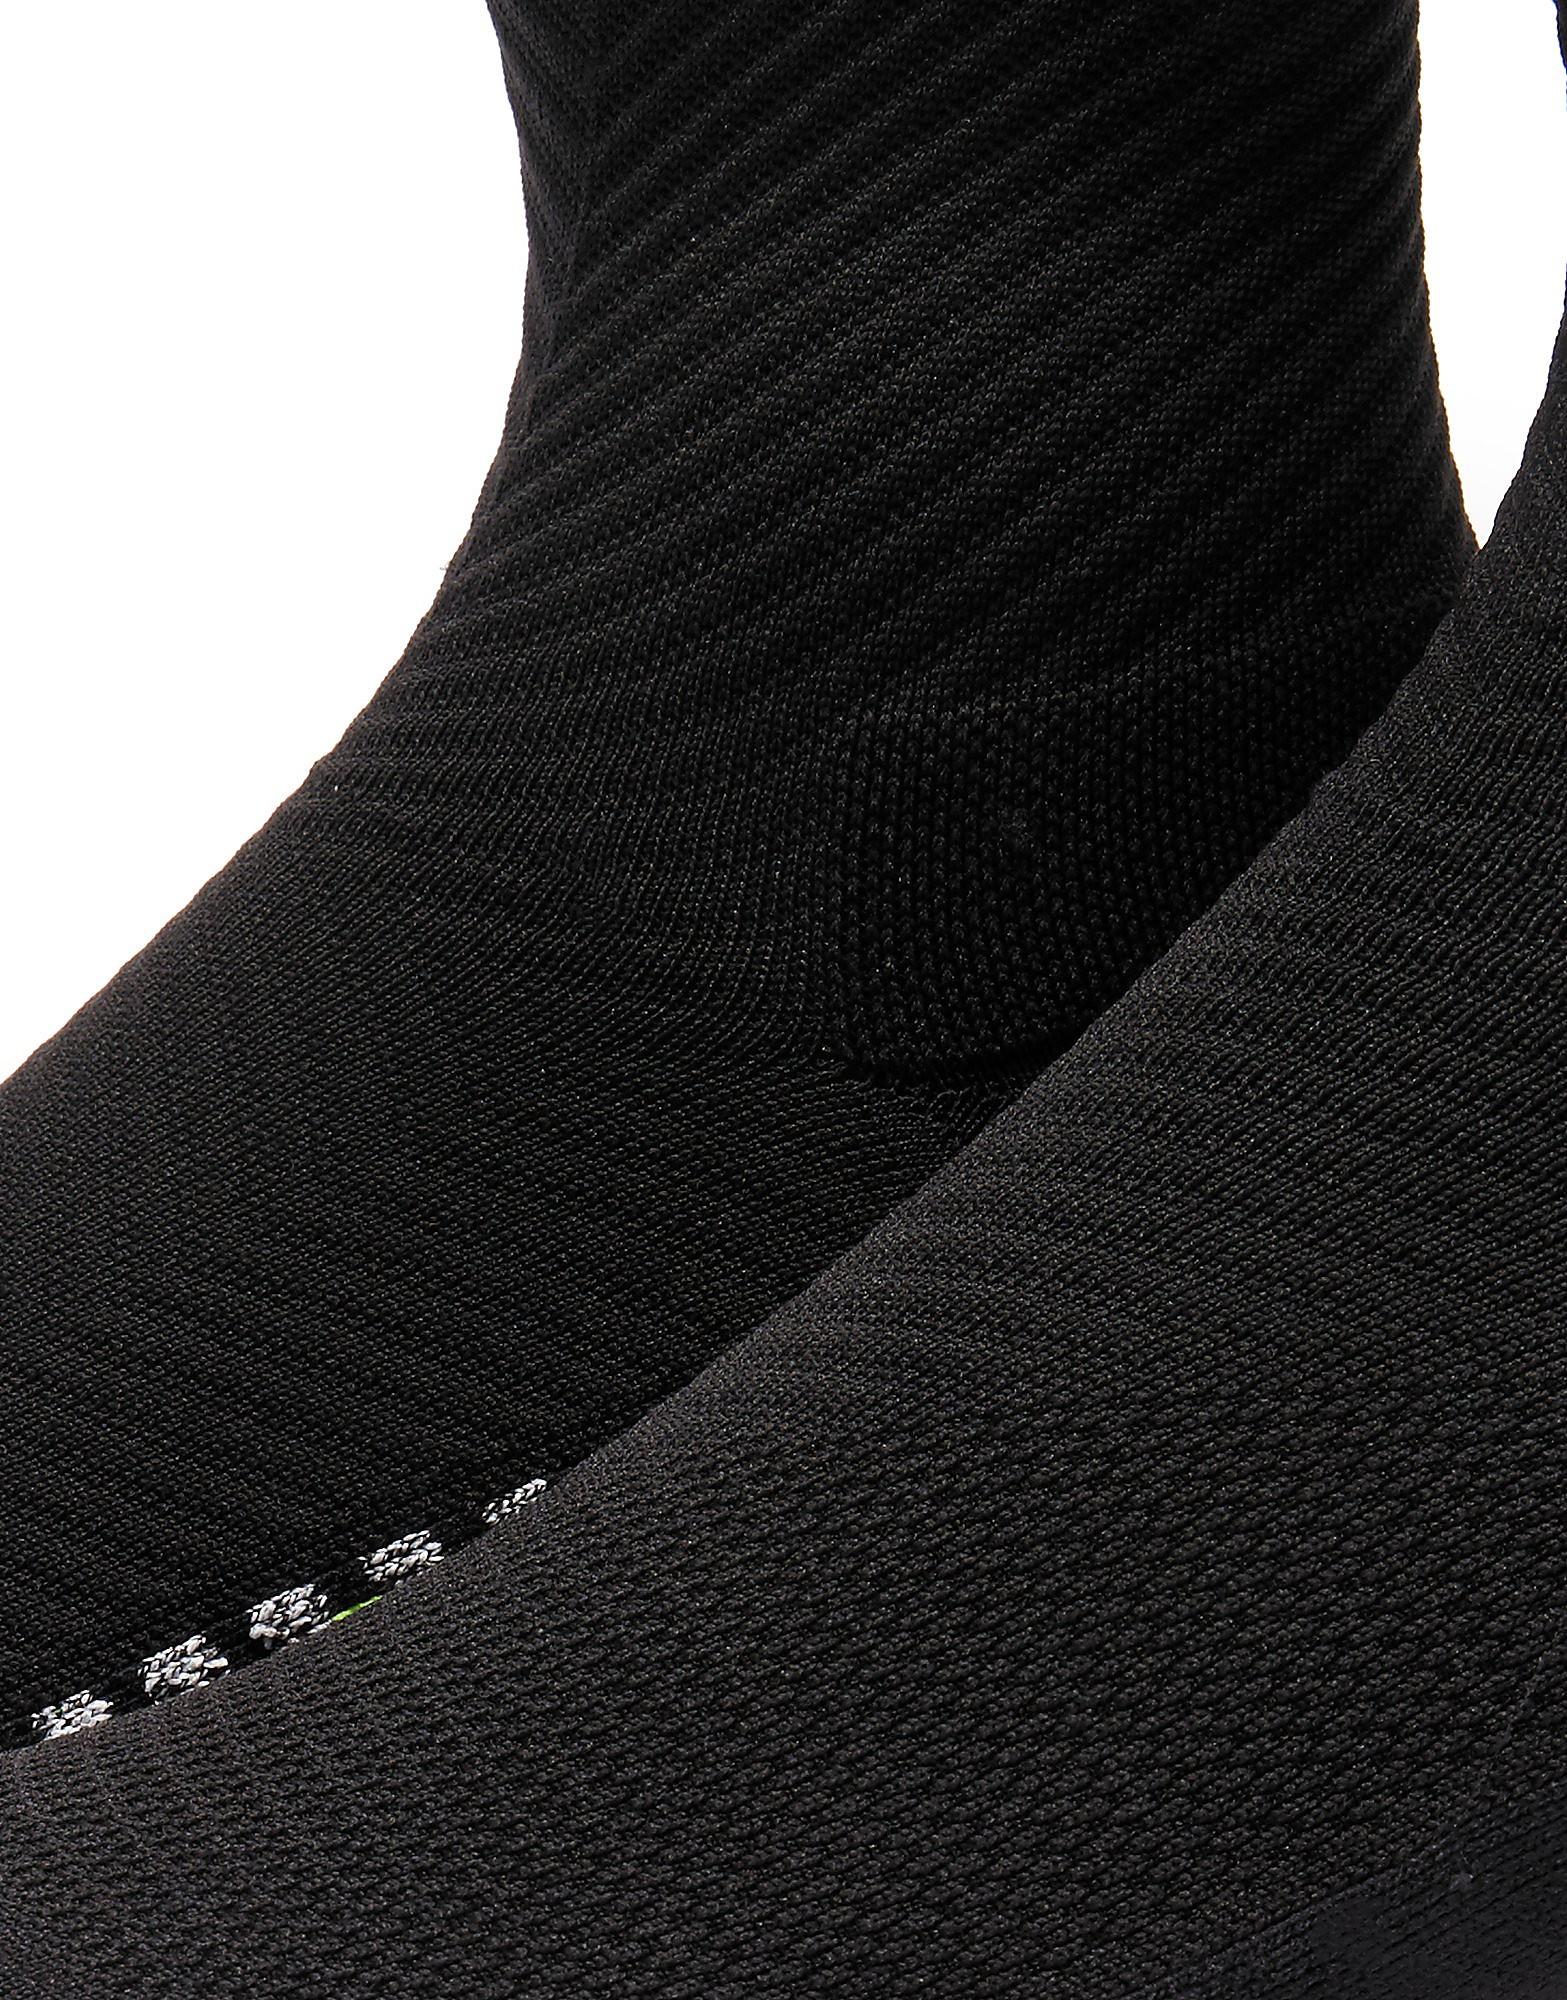 Nike Grip Strike Crew Socks